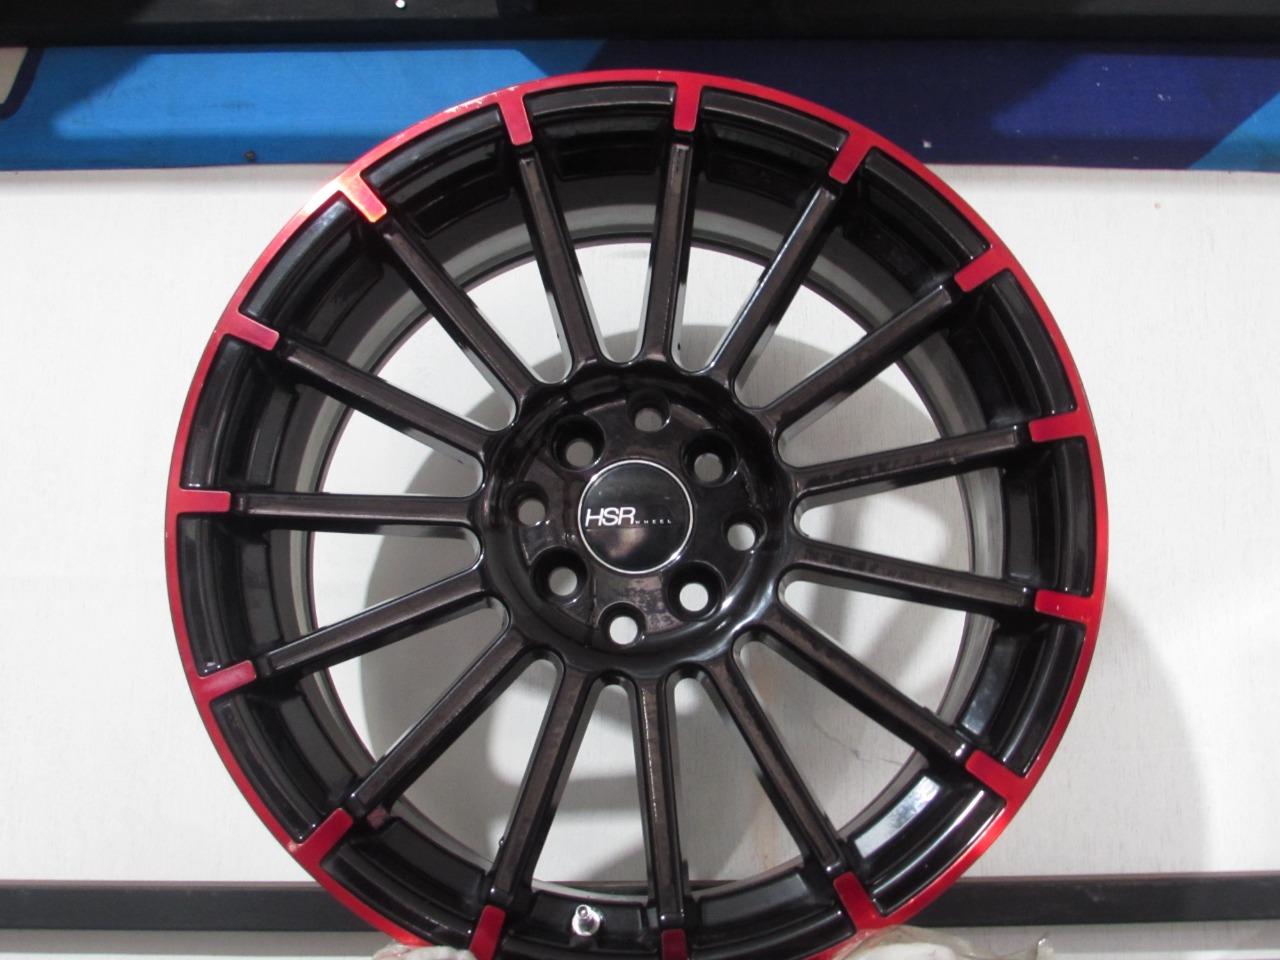 Velg mobil bekas ring 17 lebar 7 rata  hole 4×100 4×114 model jari jari by hsr wheel